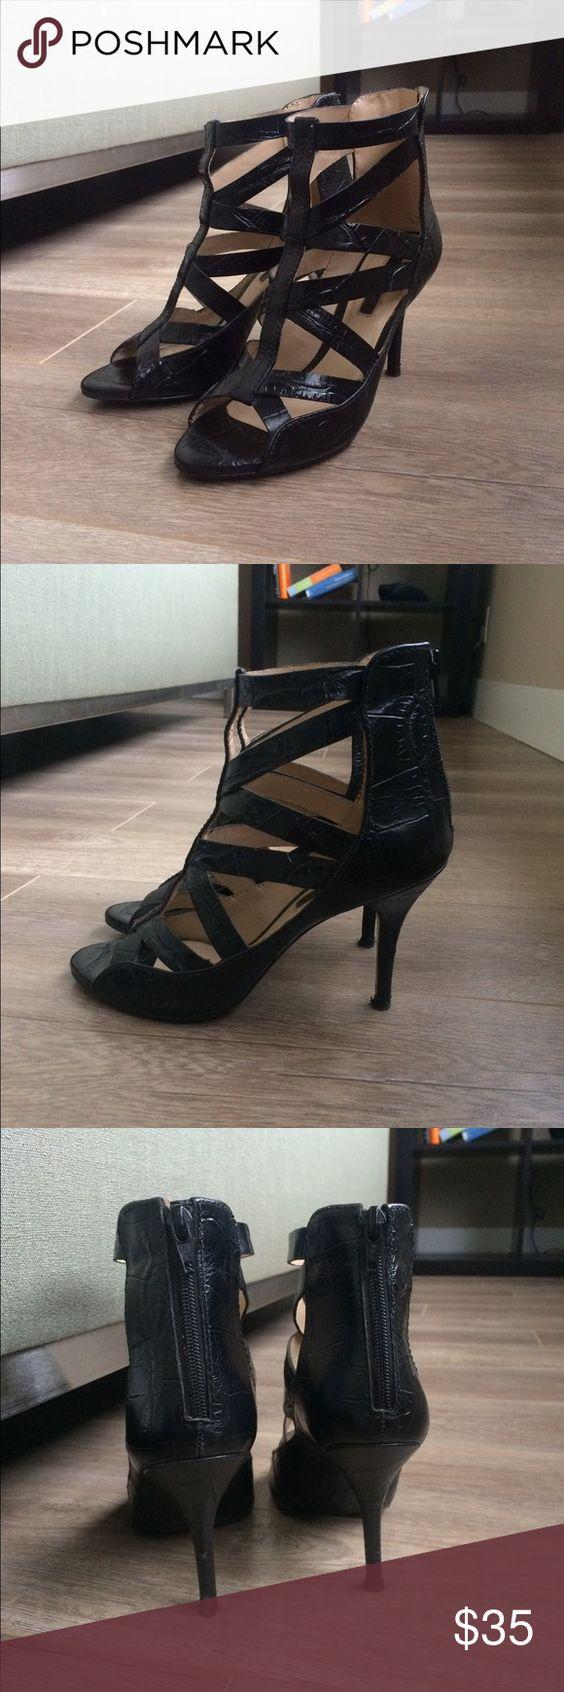 Black sandals size 7 - Zara Caged Black Sandals Size 7 Black Crocodile Embossed Sandals By Zara Size 7